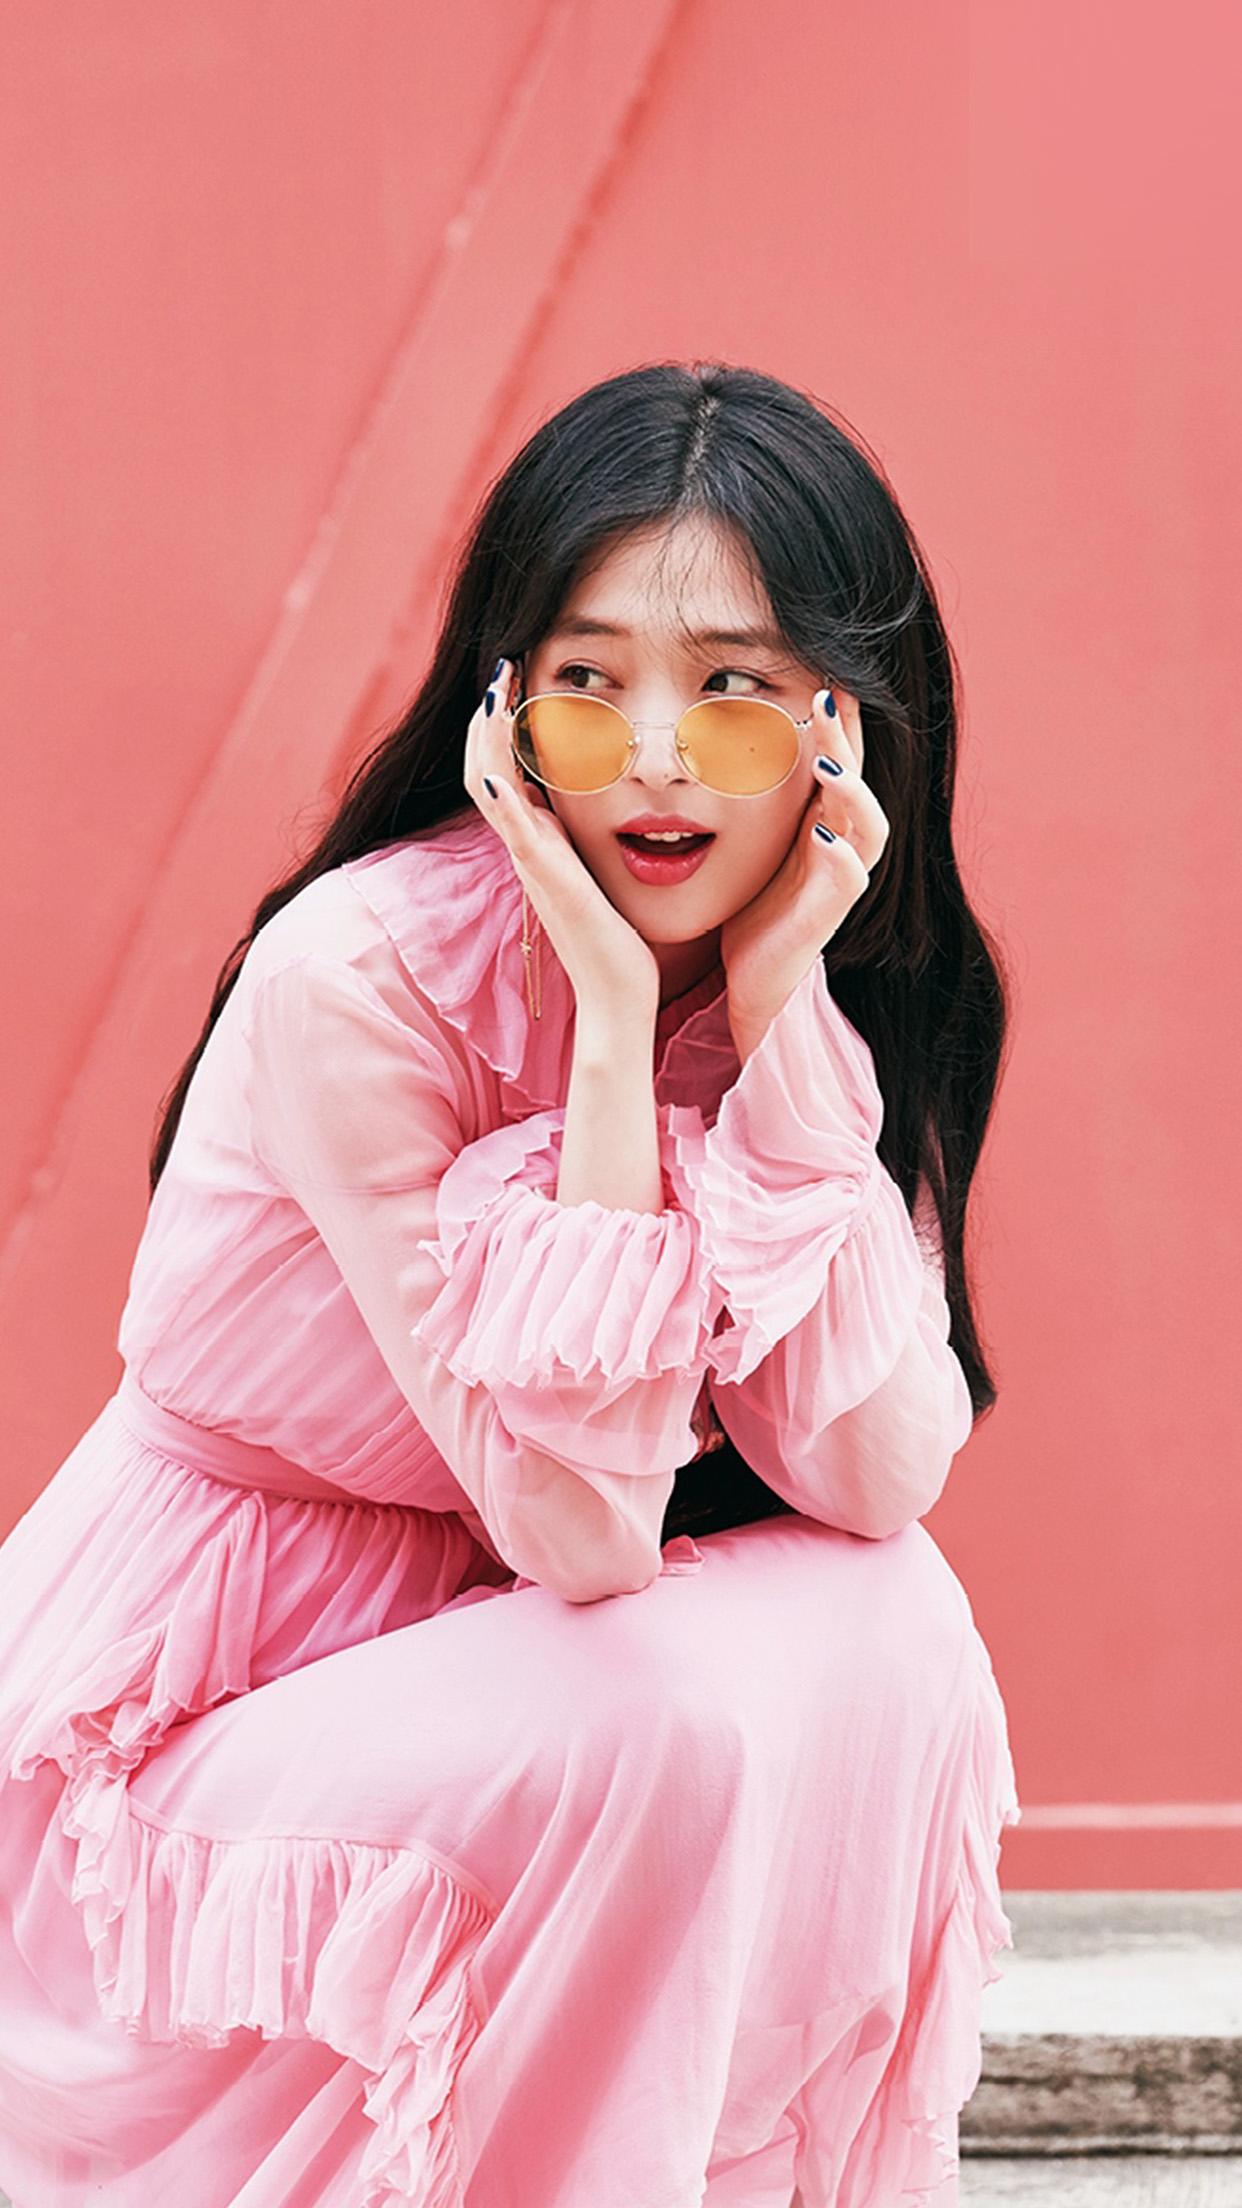 Cute Small Girl Wallpaper Ho95 Sulli Girl Kpop Pink Wallpaper